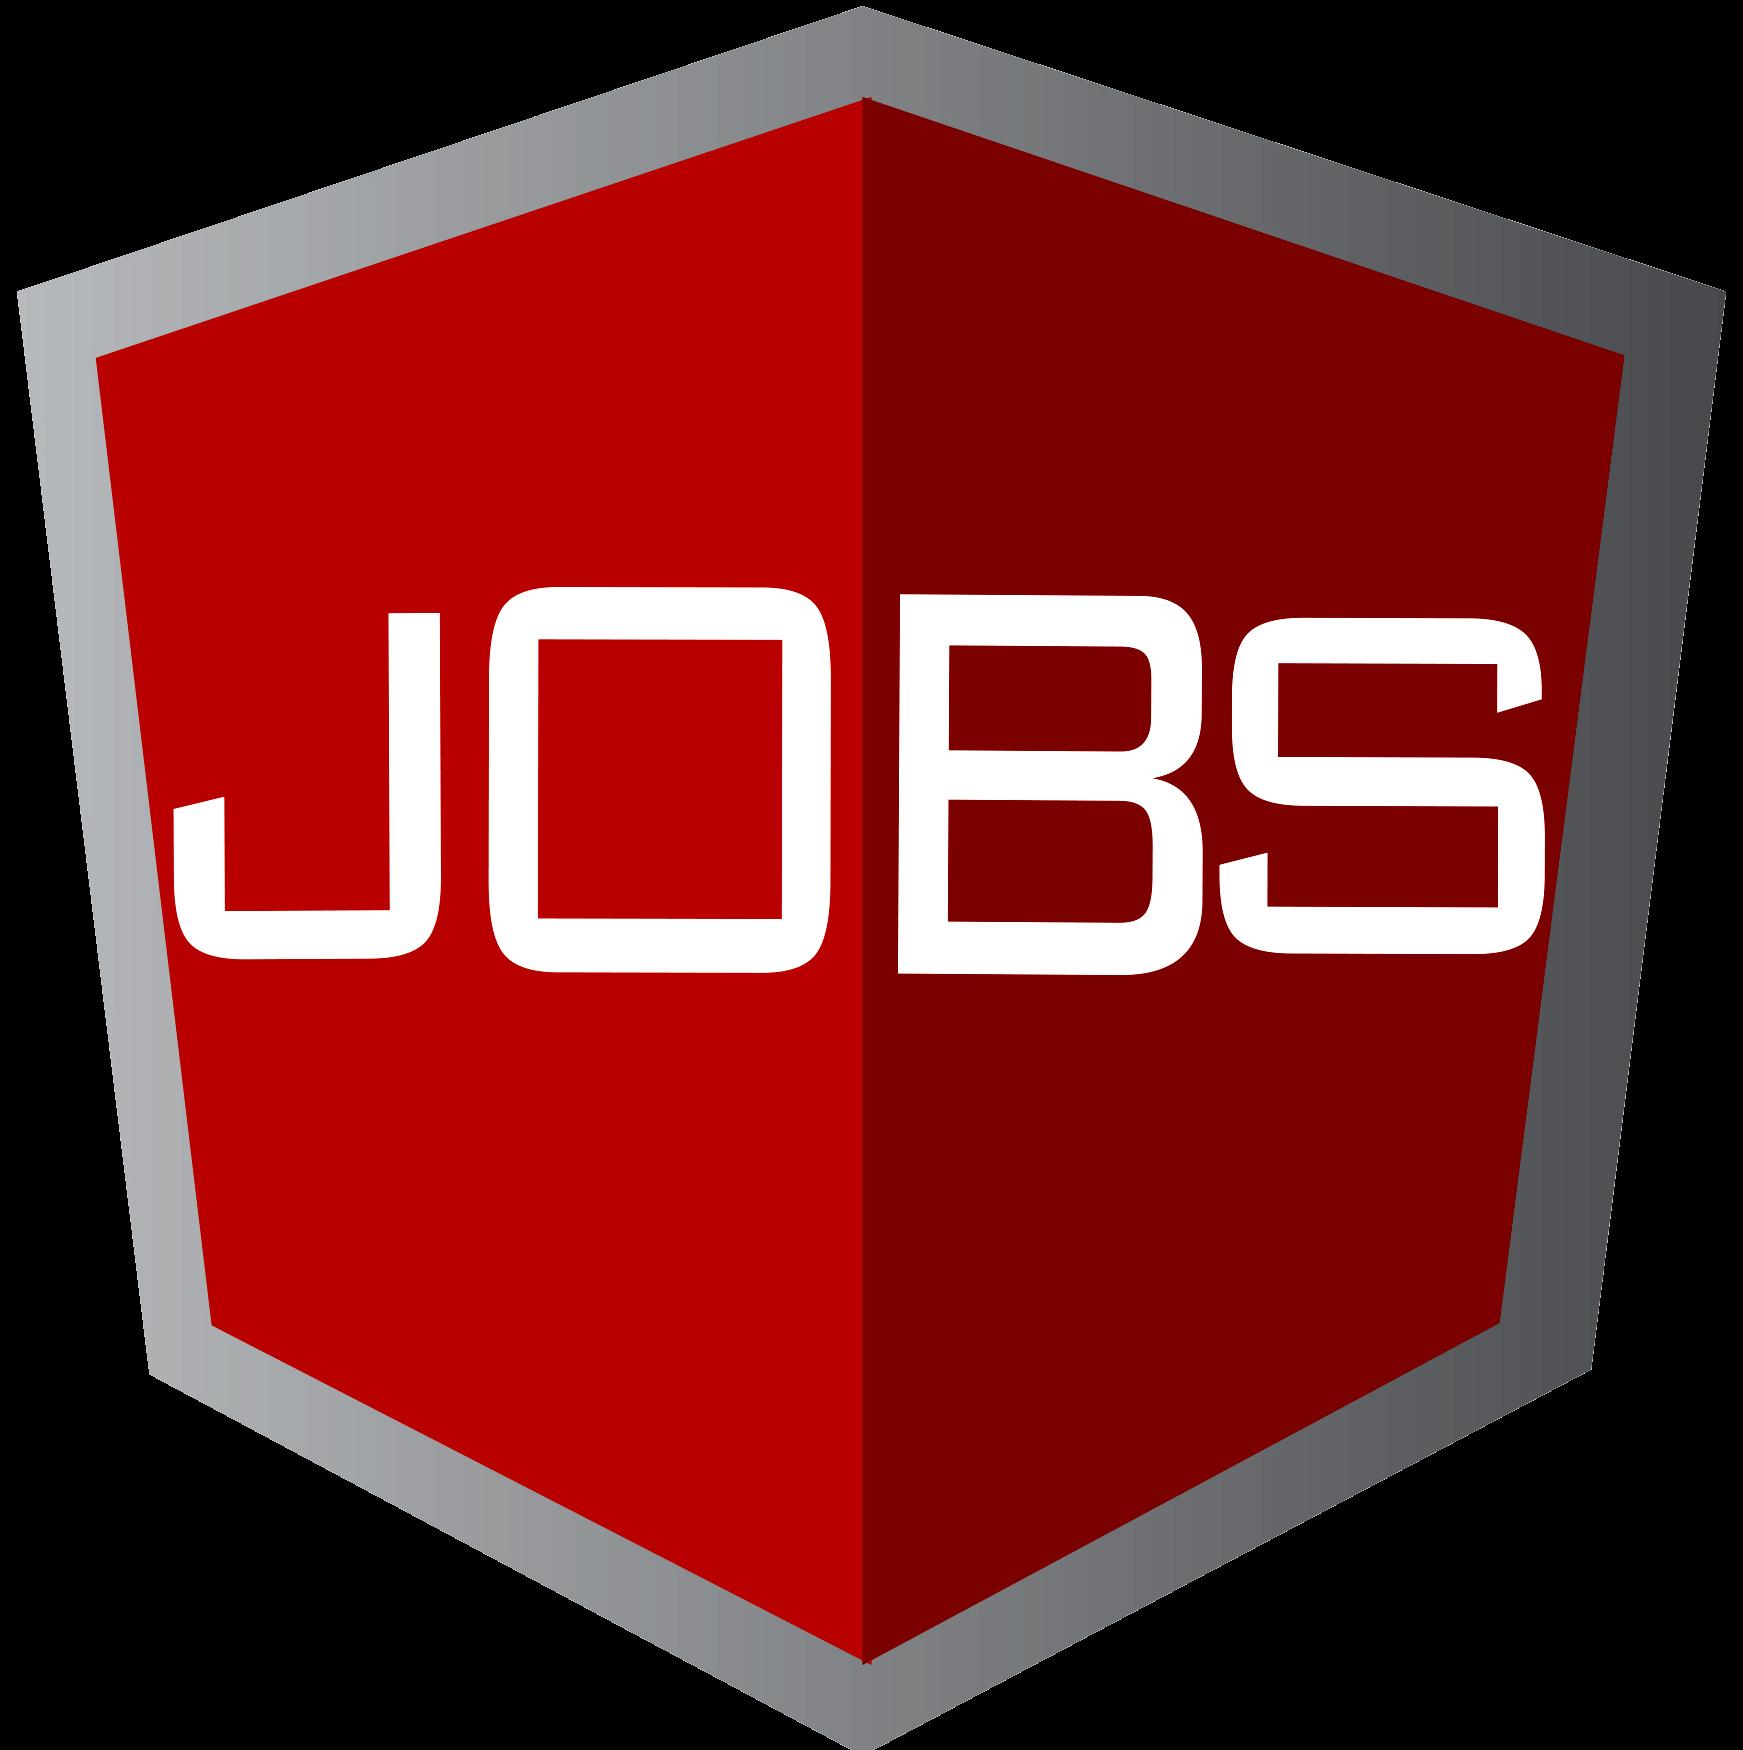 Angularjs developer talent recruitment. Jobs clipart job application